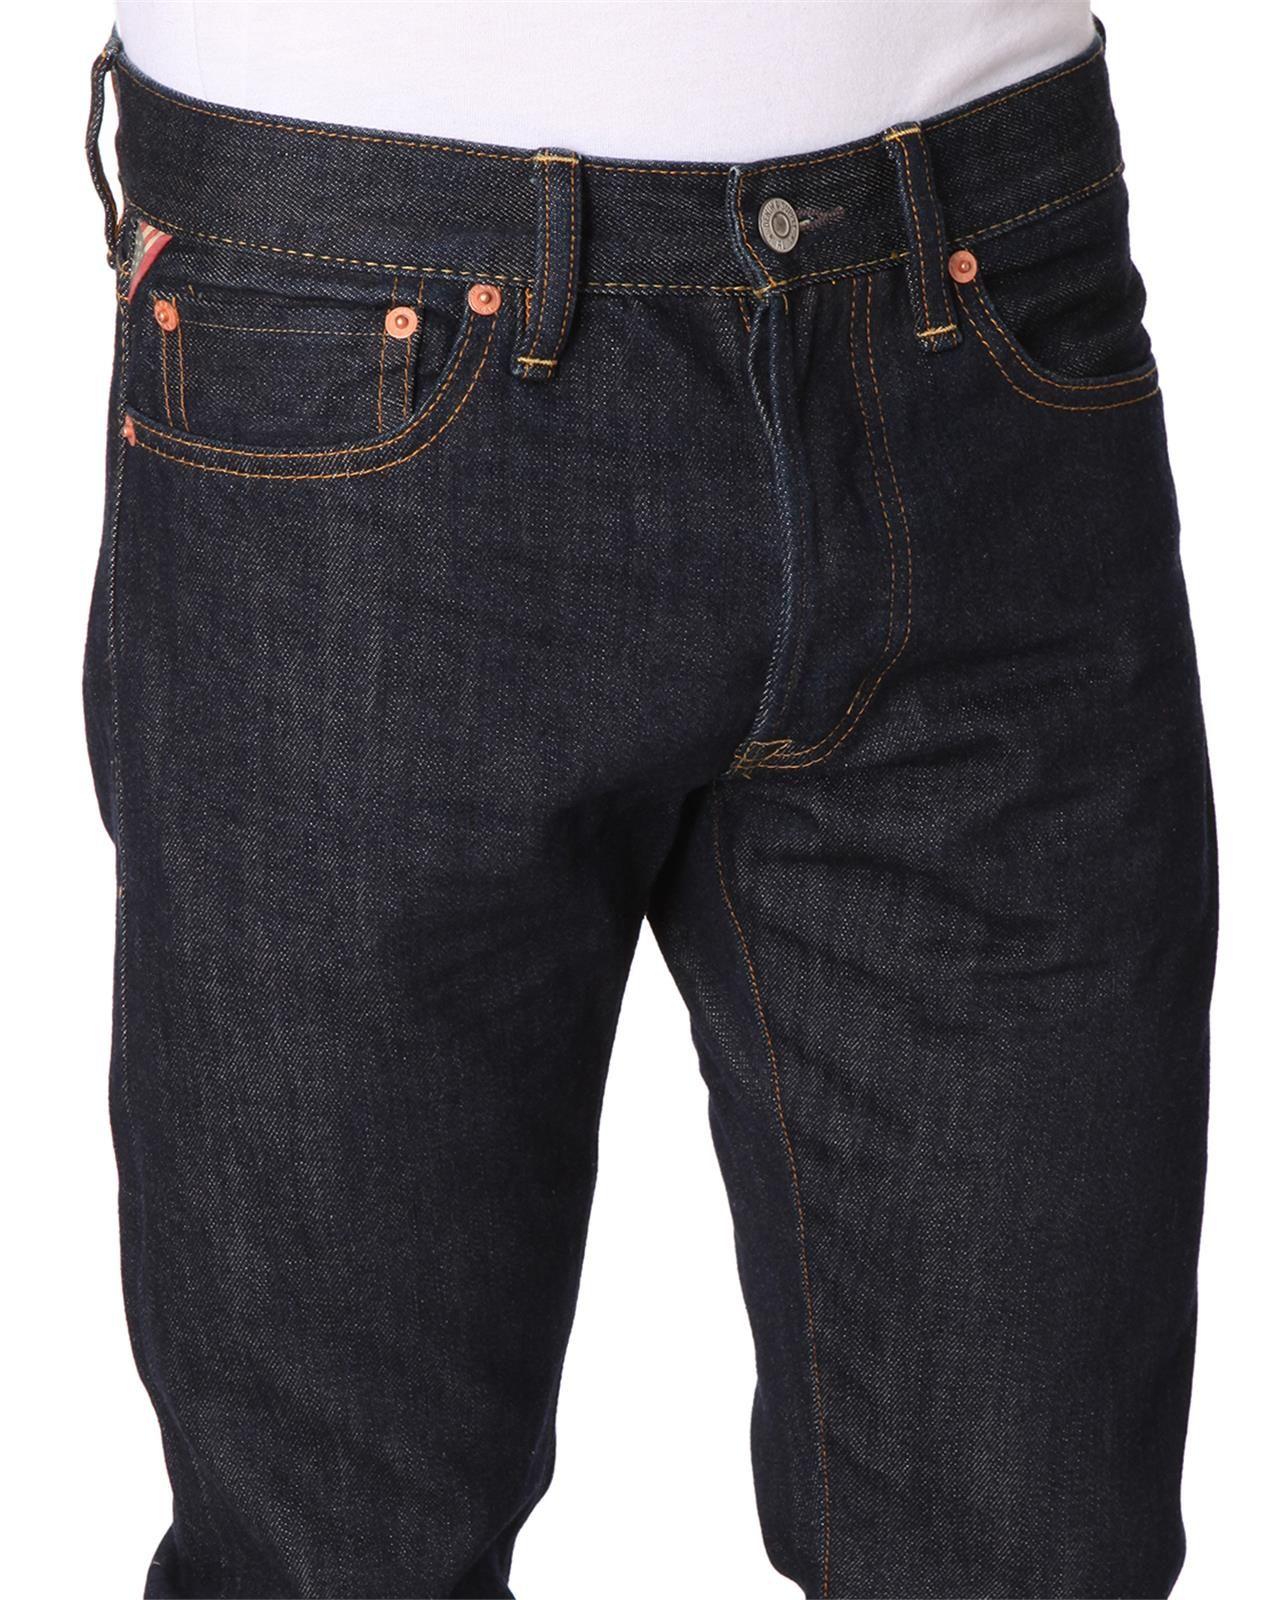 denim supply ralph lauren byron indigo slim fit jeans in. Black Bedroom Furniture Sets. Home Design Ideas